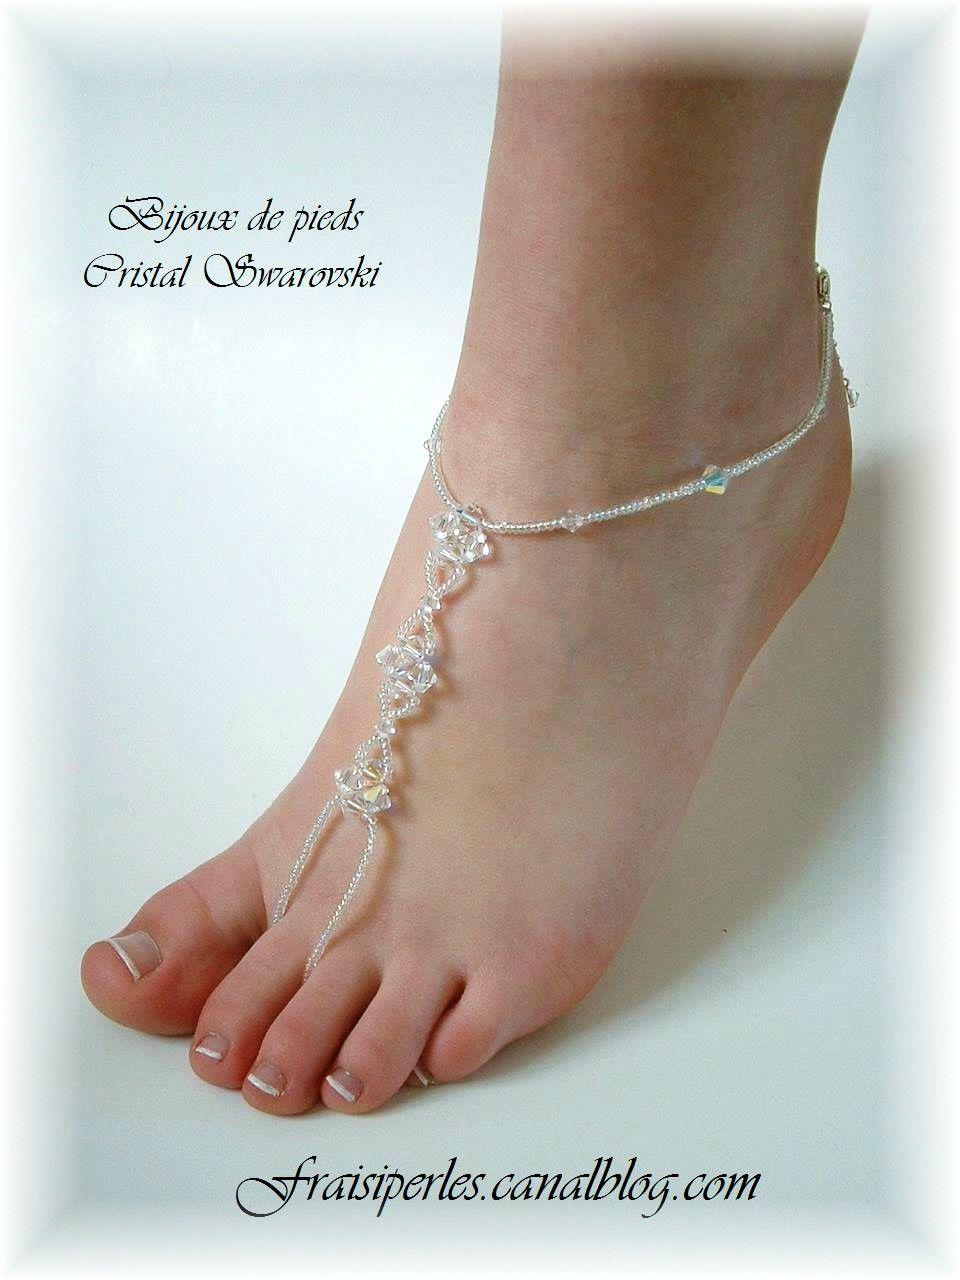 bijoux de pieds cristal